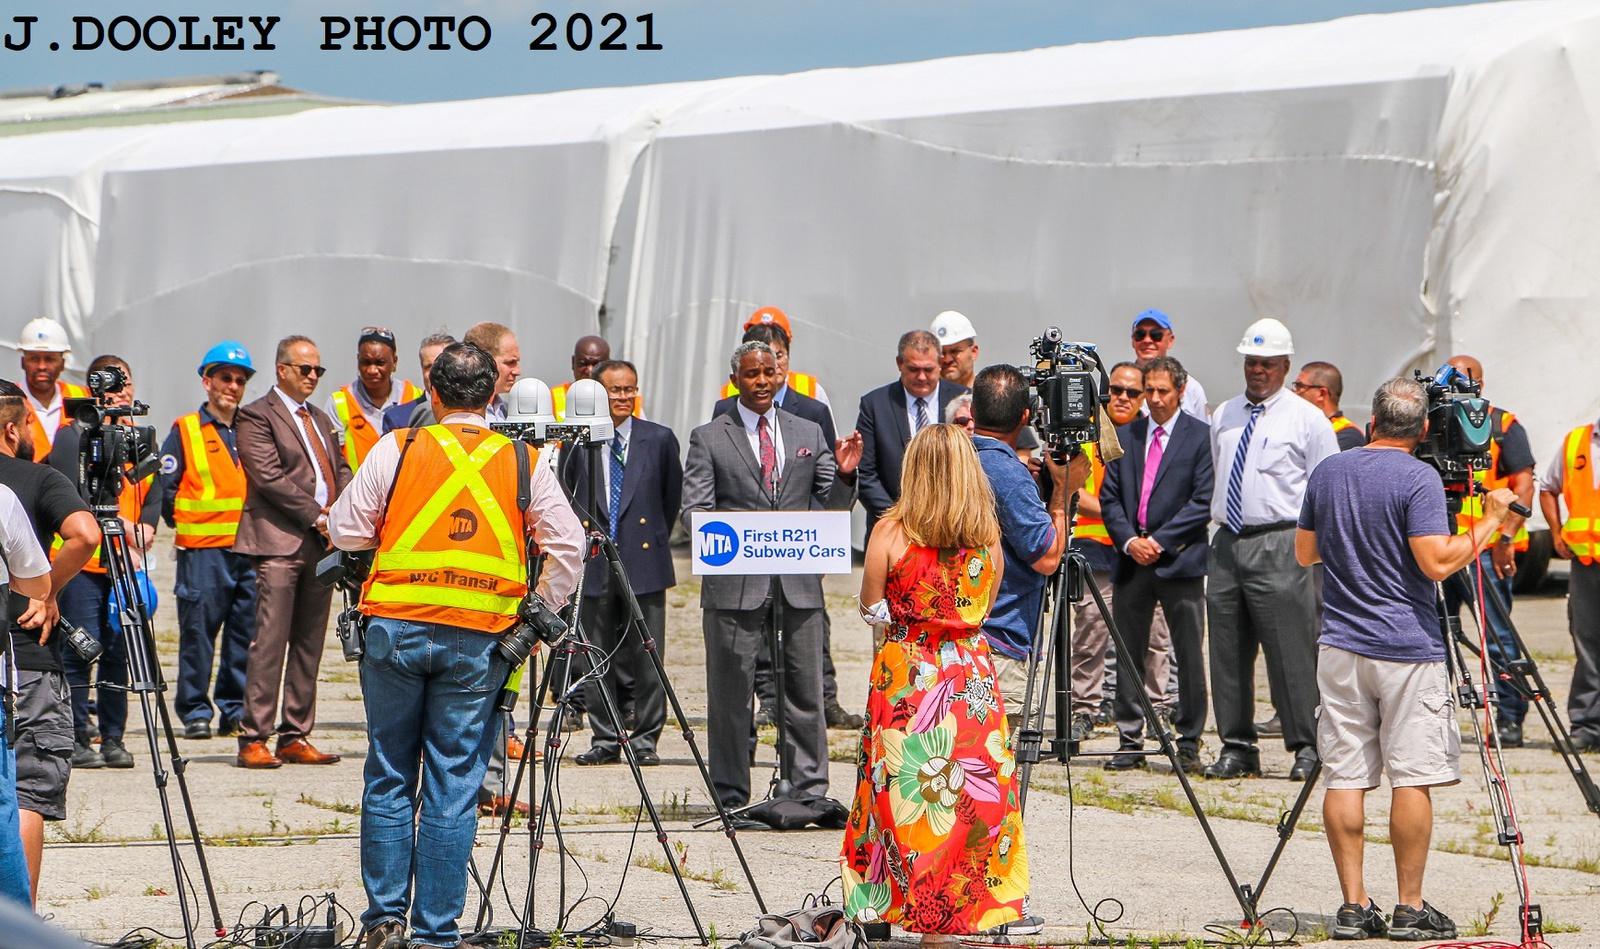 (656k, 1600x949)<br><b>Country:</b> United States<br><b>City:</b> New York<br><b>System:</b> New York City Transit<br><b>Car:</b> R-211 (Kawasaki, 2021-)  <br><b>Photo by:</b> John Dooley<br><b>Date:</b> 7/1/2021<br><b>Notes:</b> R-211 delivery and press conference.<br><b>Viewed (this week/total):</b> 3 / 197